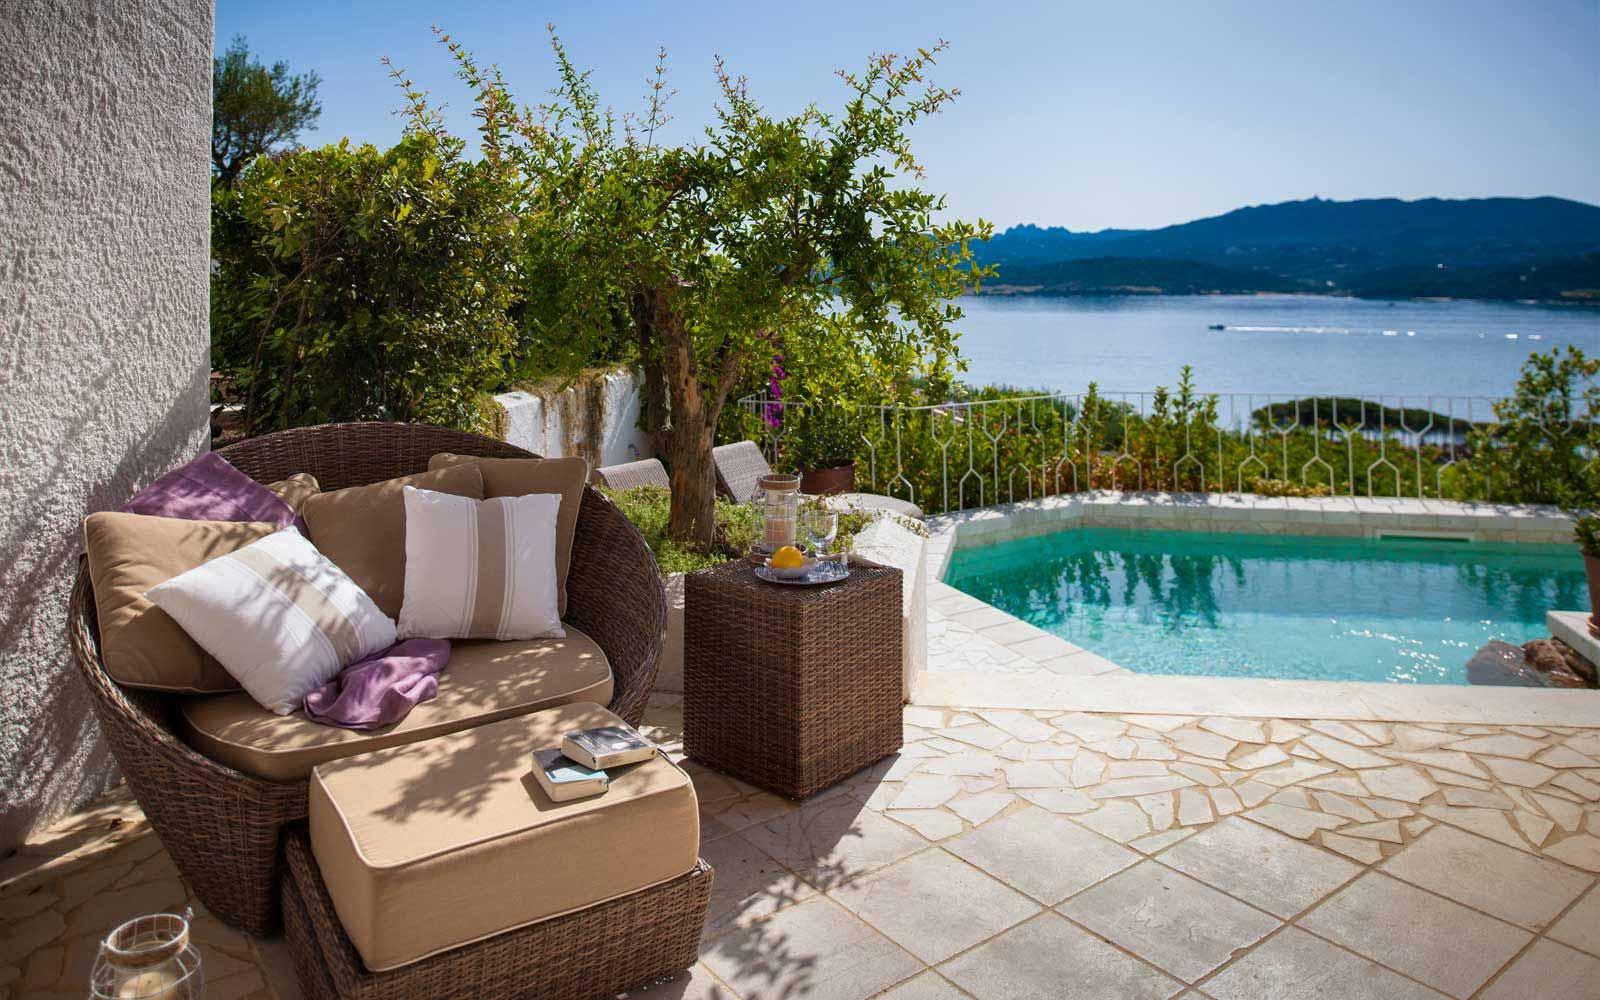 A Luxury Suite at Hotel Relais Villa Del Golfo & Spa